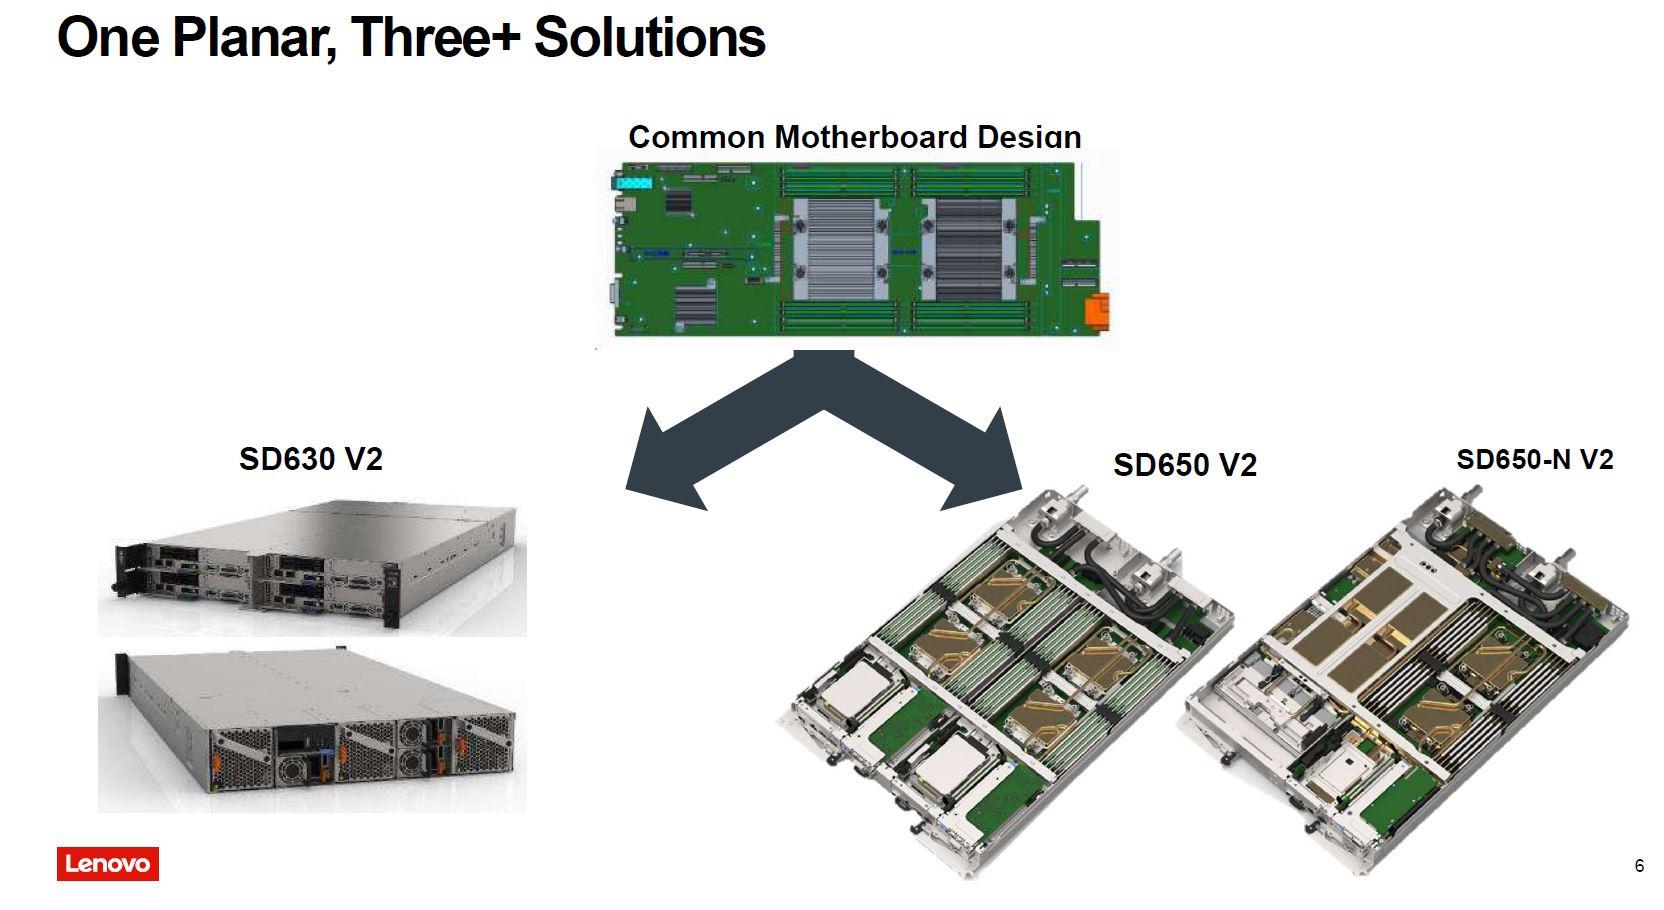 Lenovo Liquid Cooling Neptune Common Motherboard Design Q3 2021